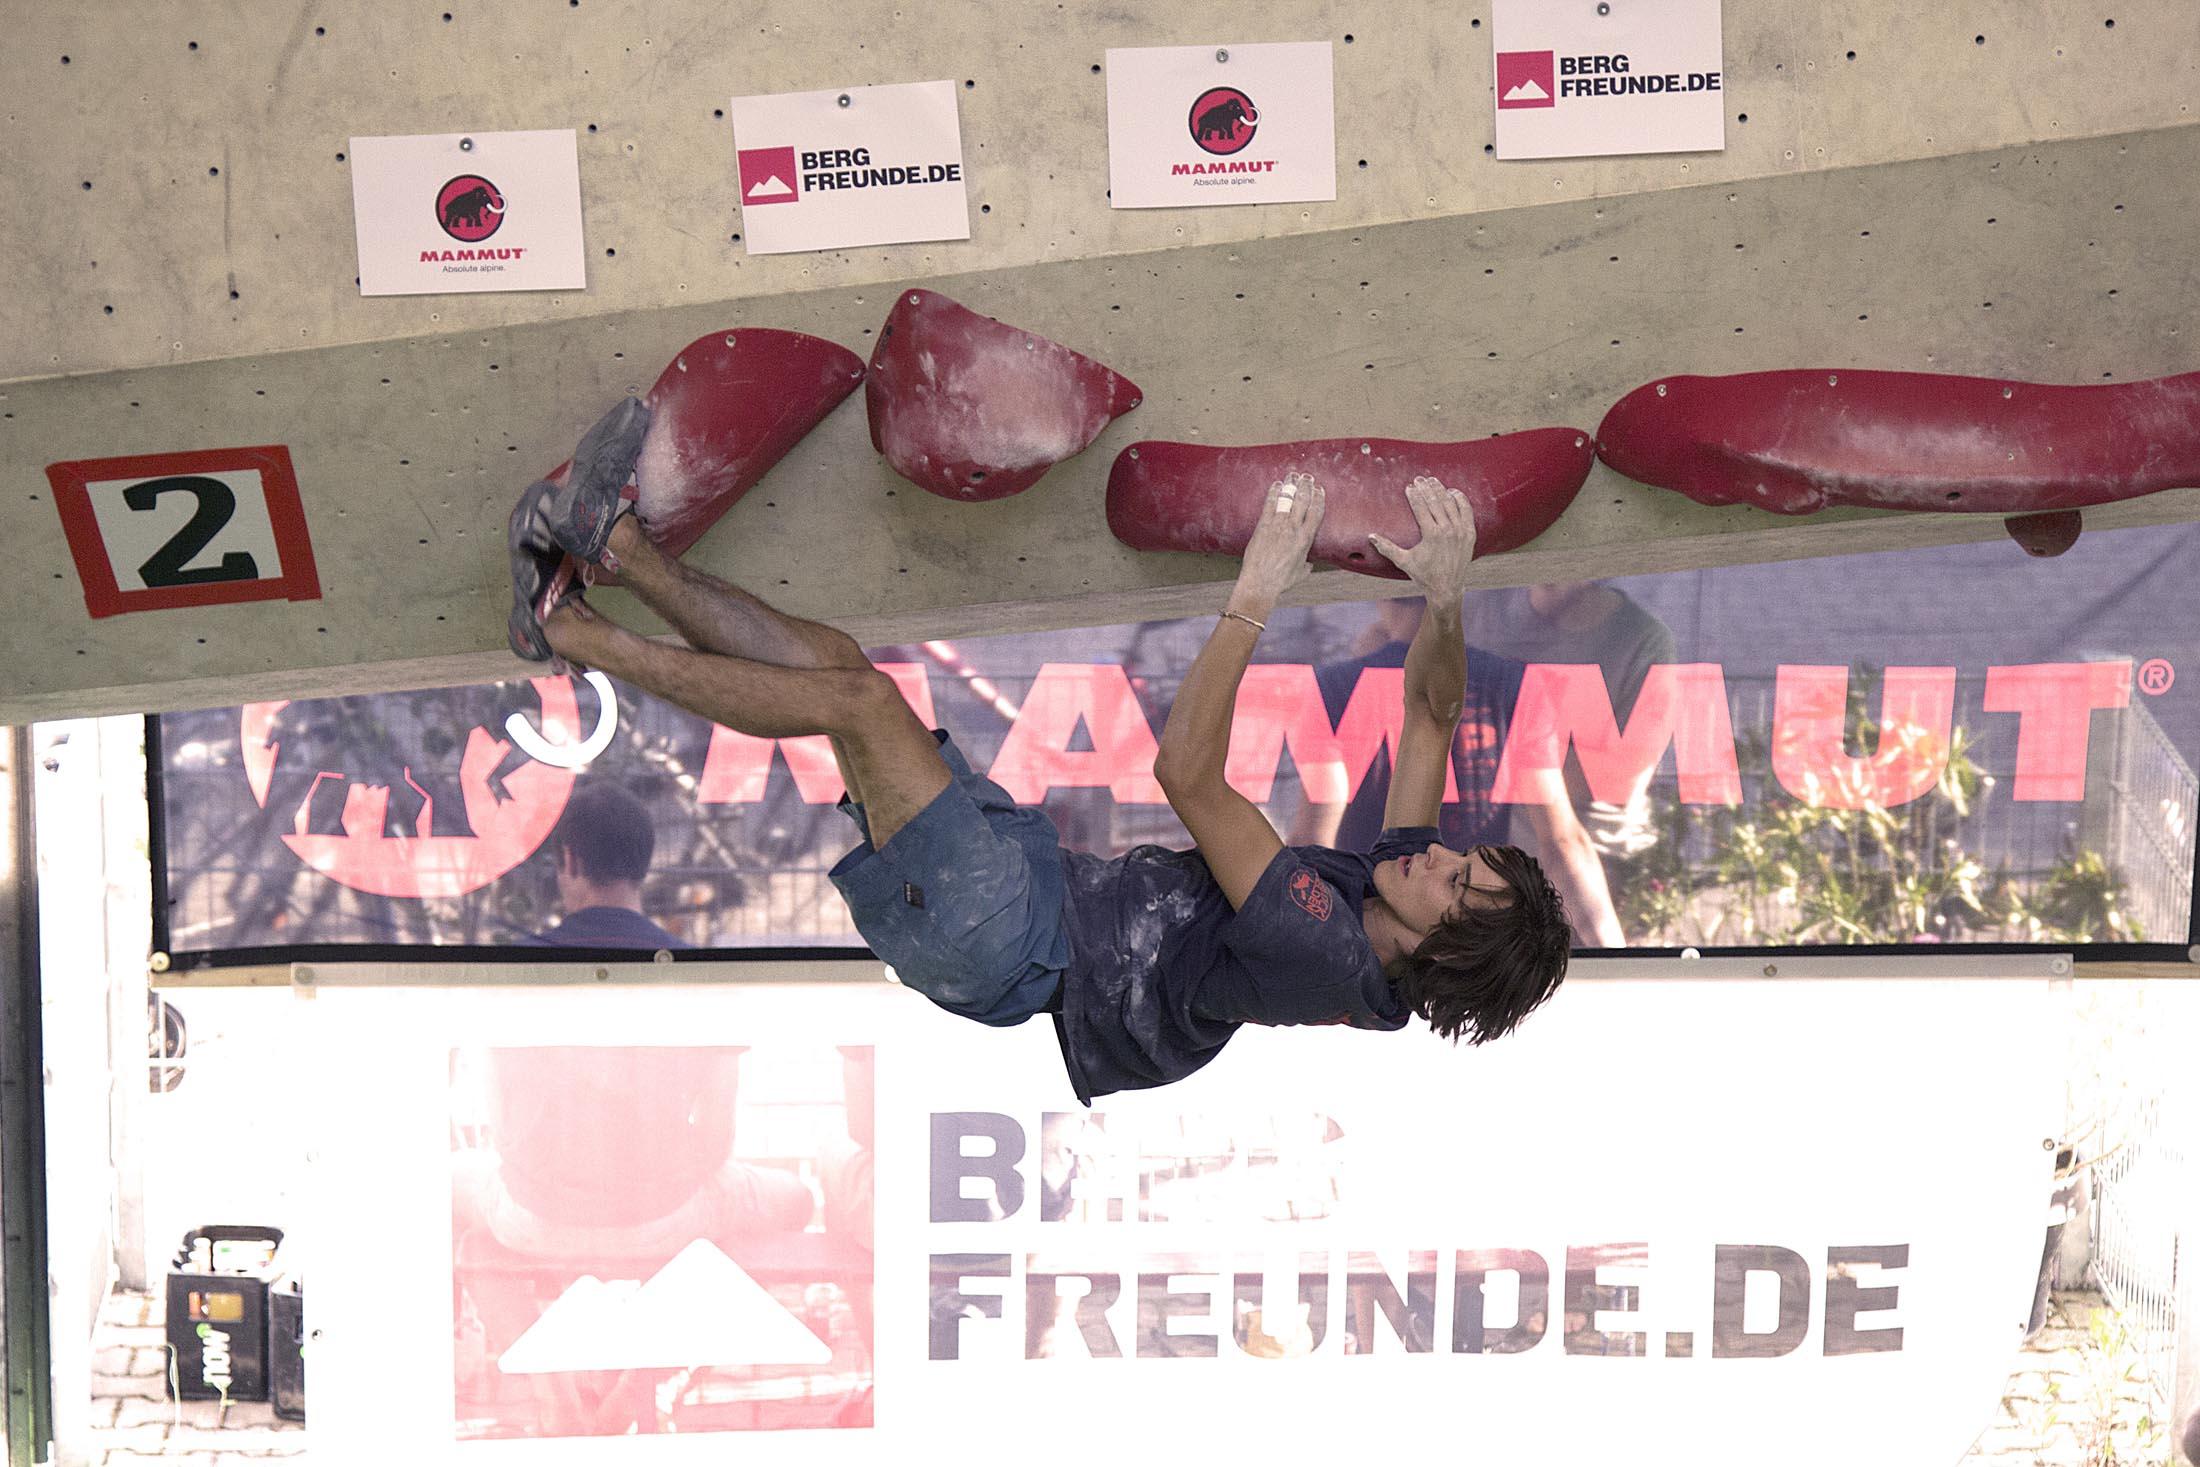 Finale, internationaler bouldercup Frankenjura 2016, BLOCKHELDEN Erlangen, Mammut, Bergfreunde.de, Boulderwettkampf07092016613